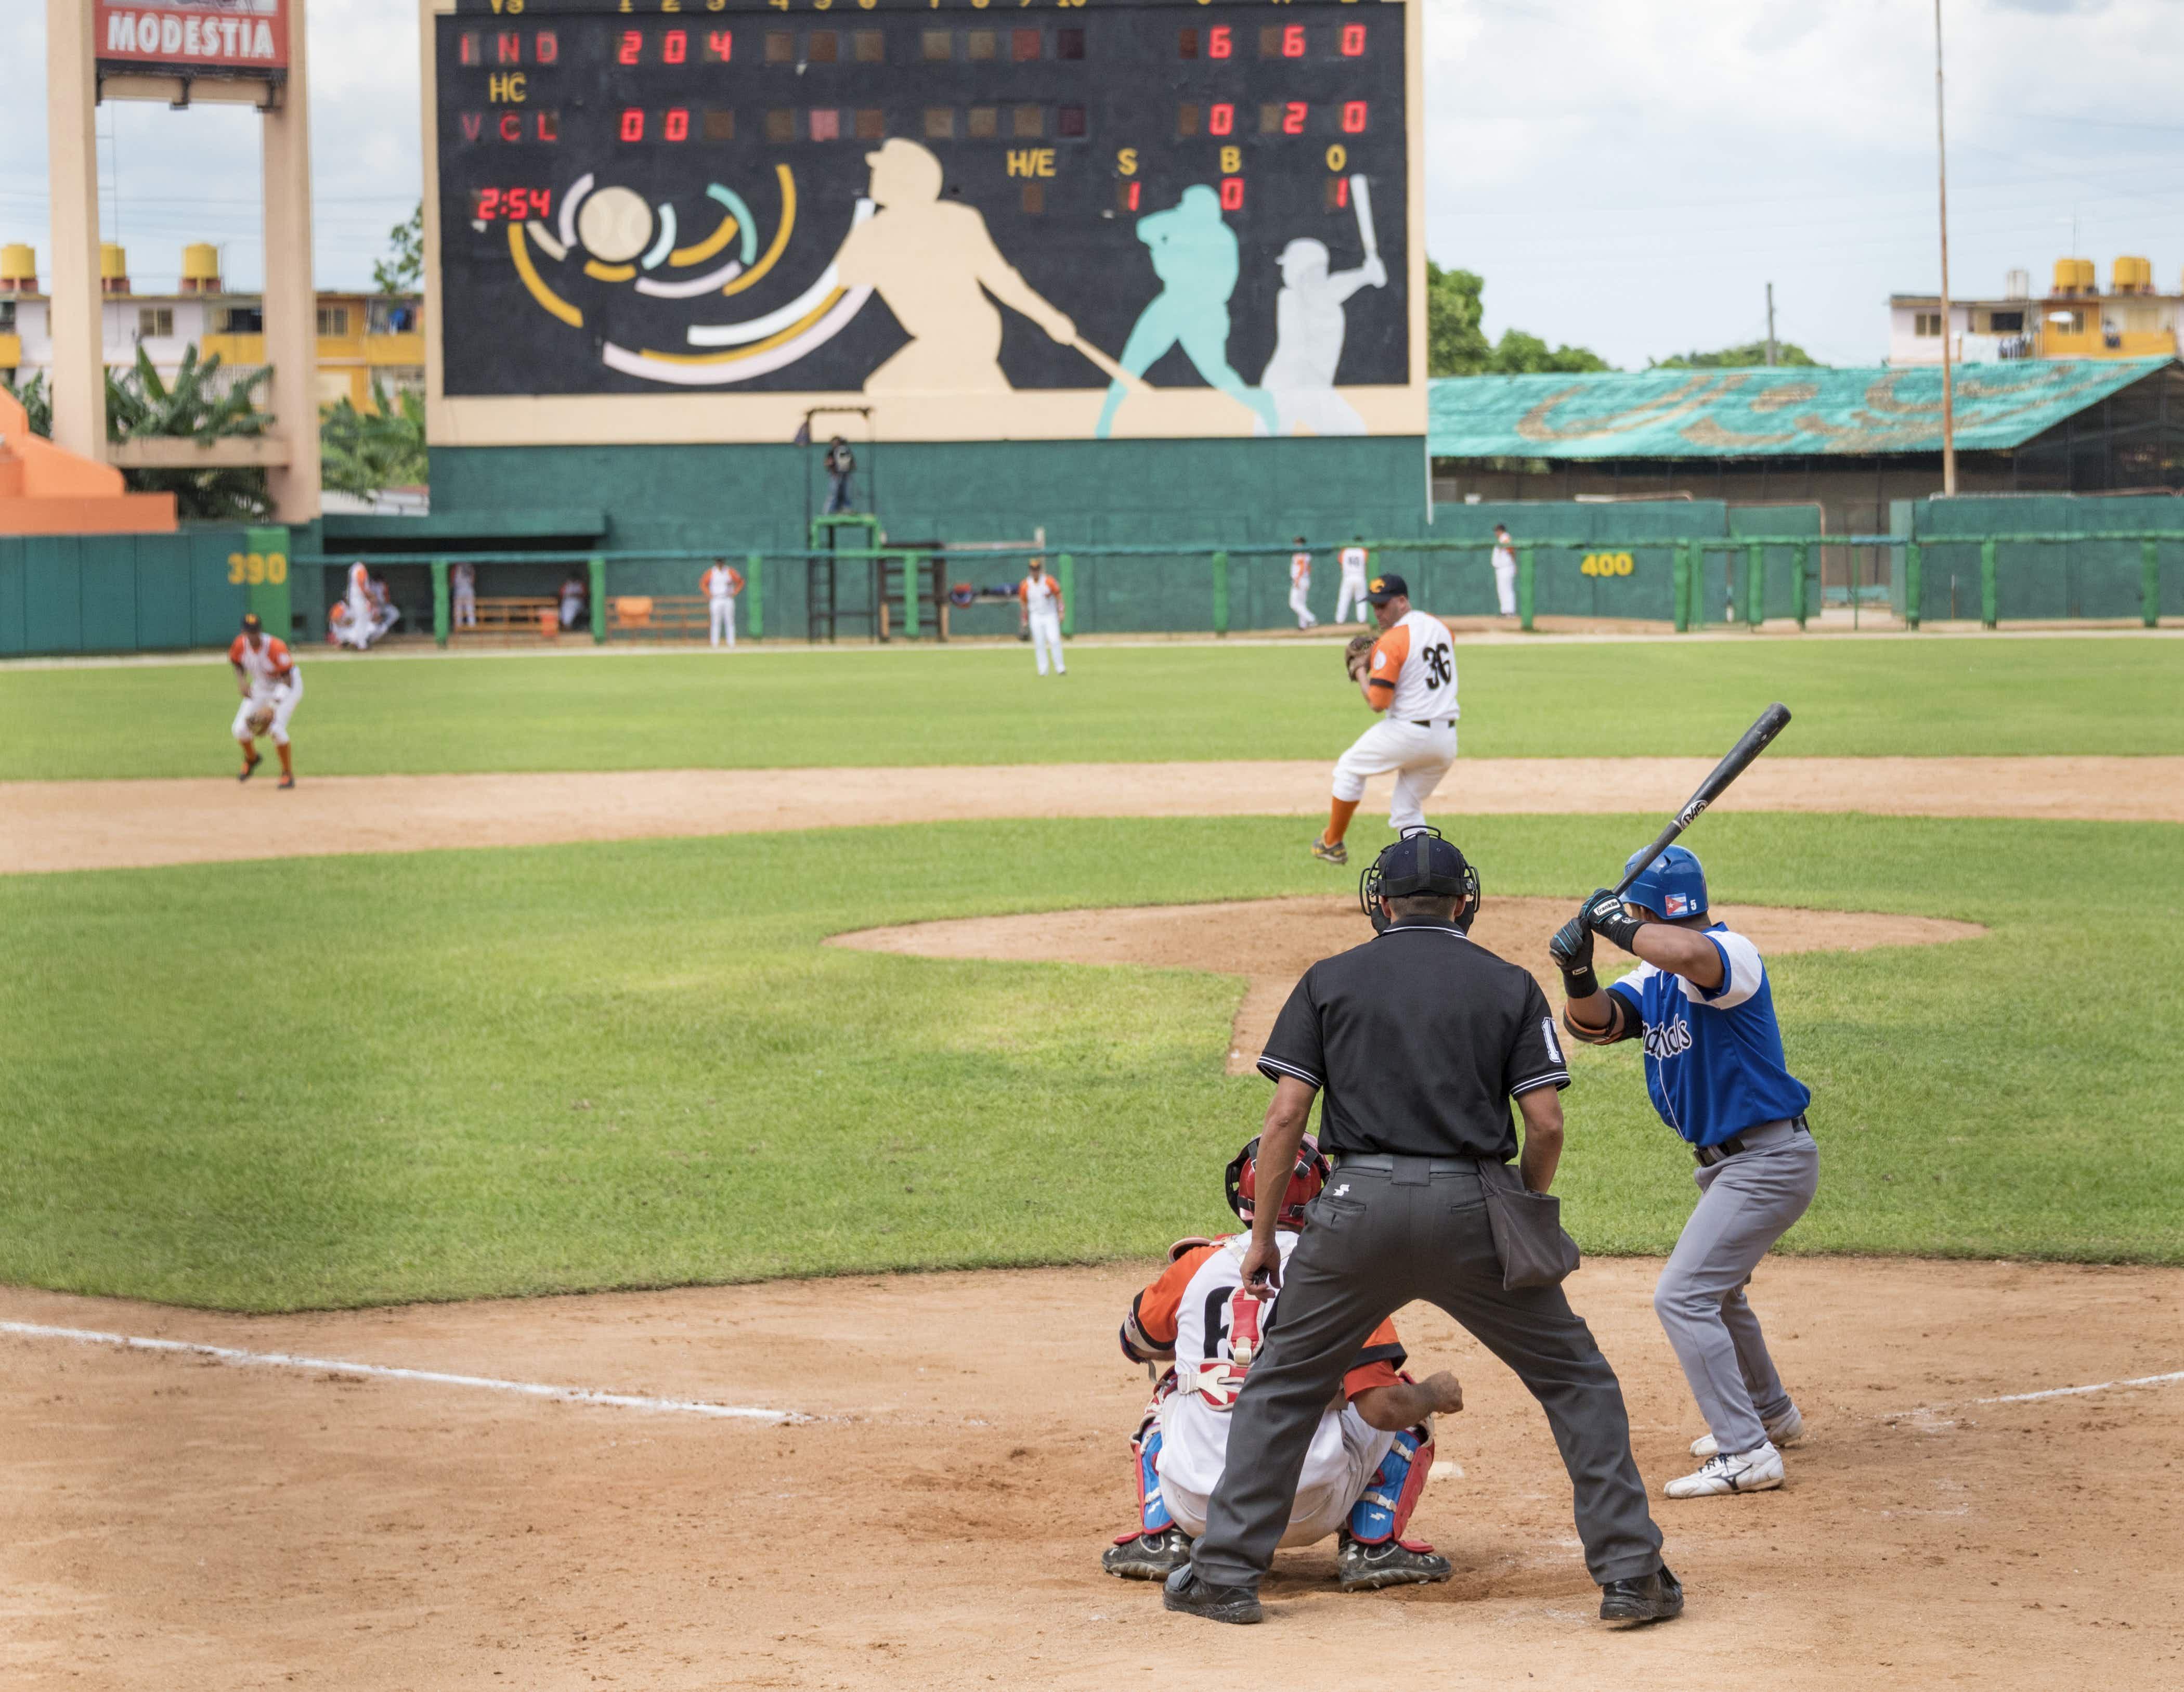 Havana shows off its sporty side